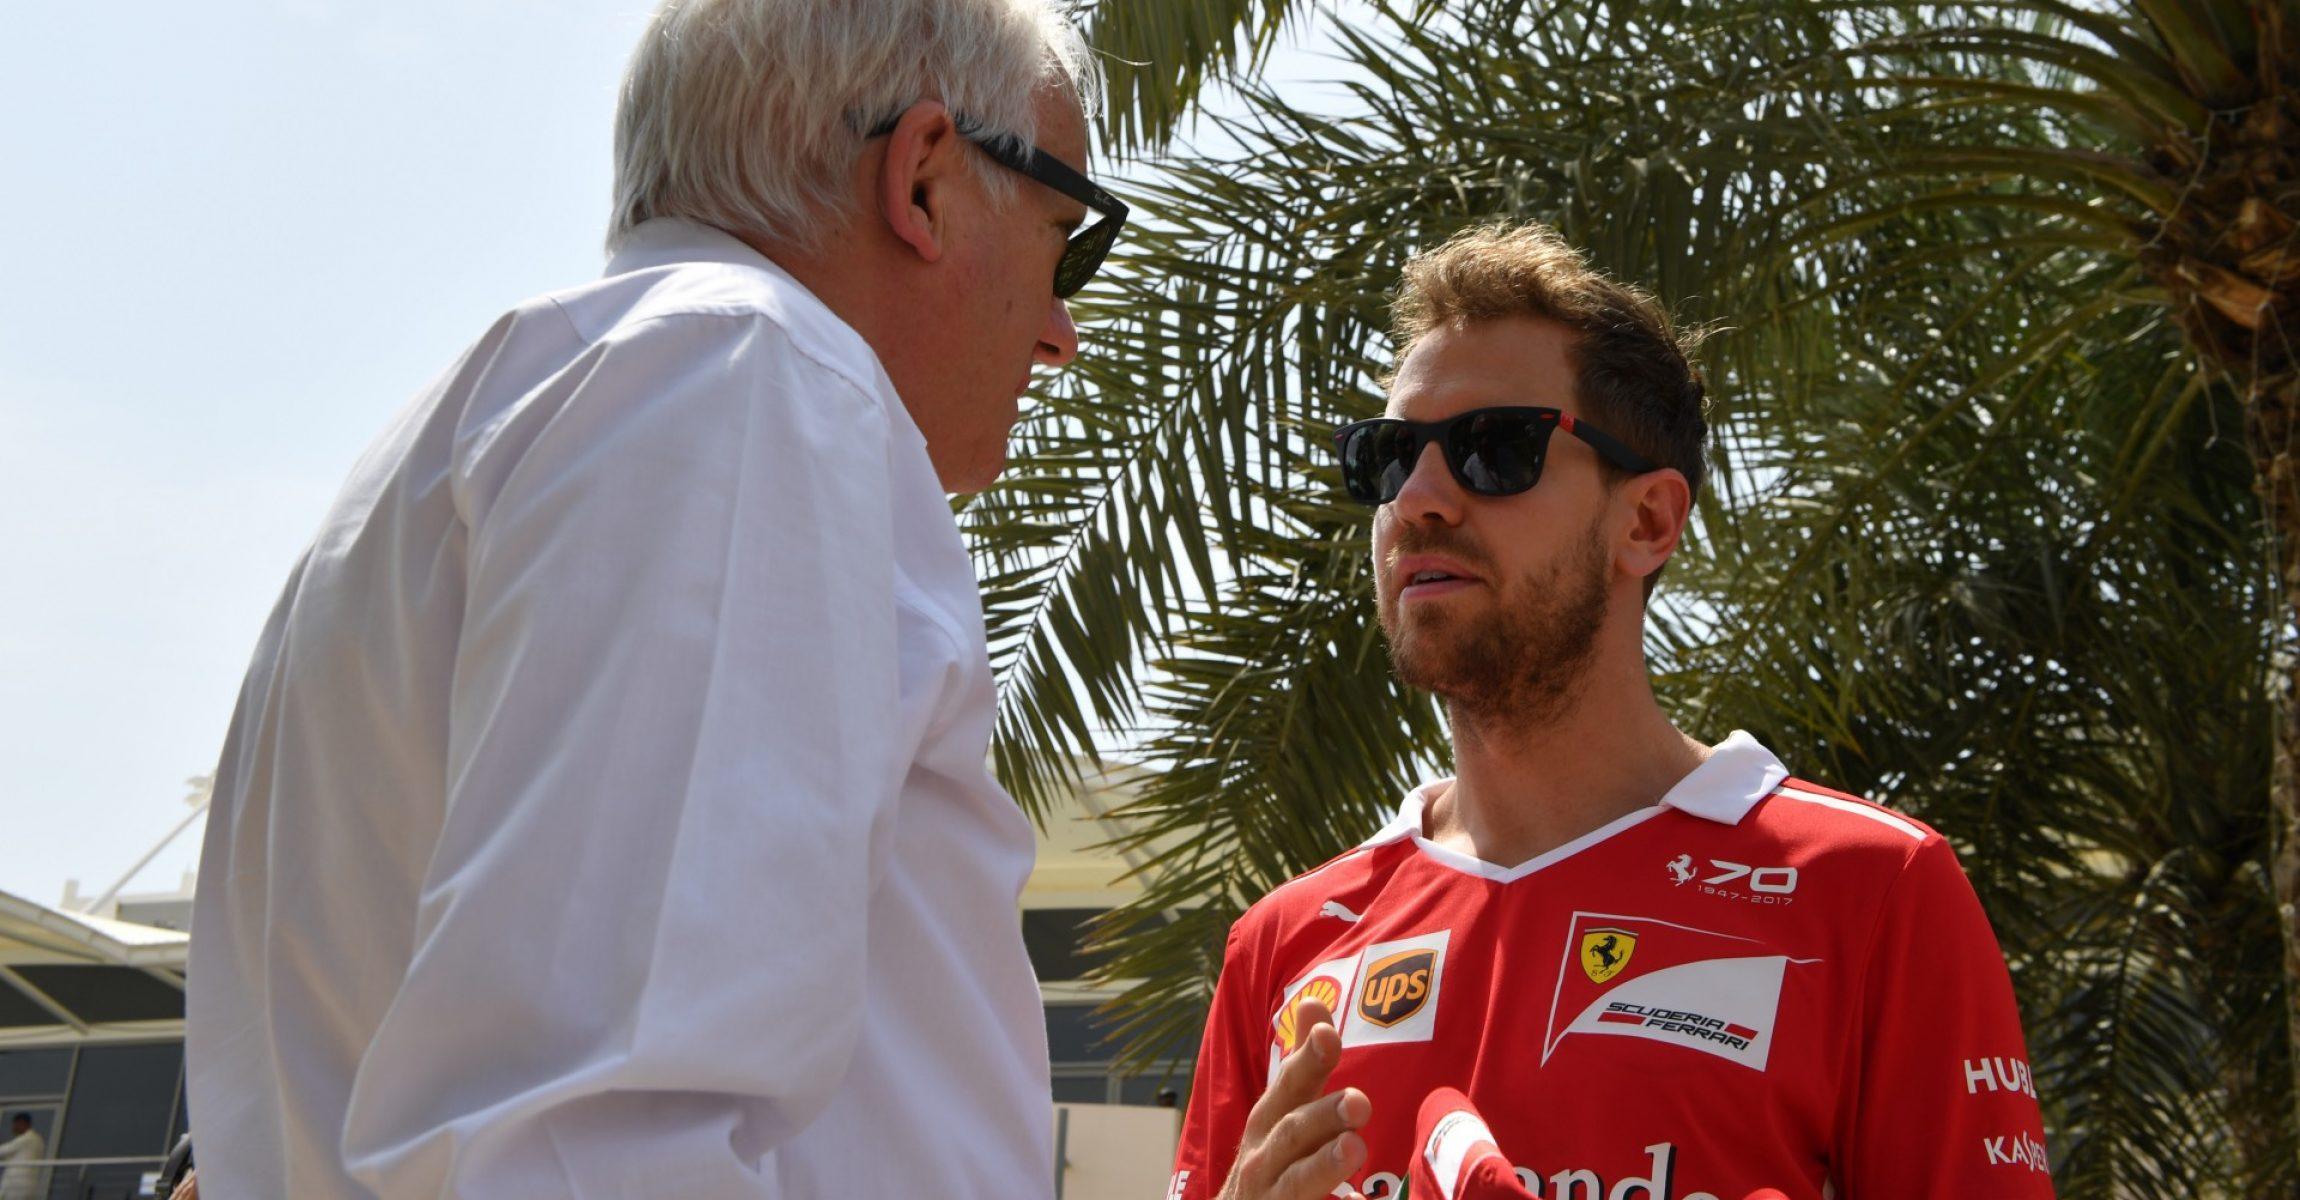 Sebastian Vettel (GER) Ferrari with Charlie Whiting (GBR) FIA Delegate at Formula One World Championship, Rd3, Bahrain Grand Prix Preparations, Bahrain International Circuit, Sakhir, Bahrain, Thursday 13 April 2017.